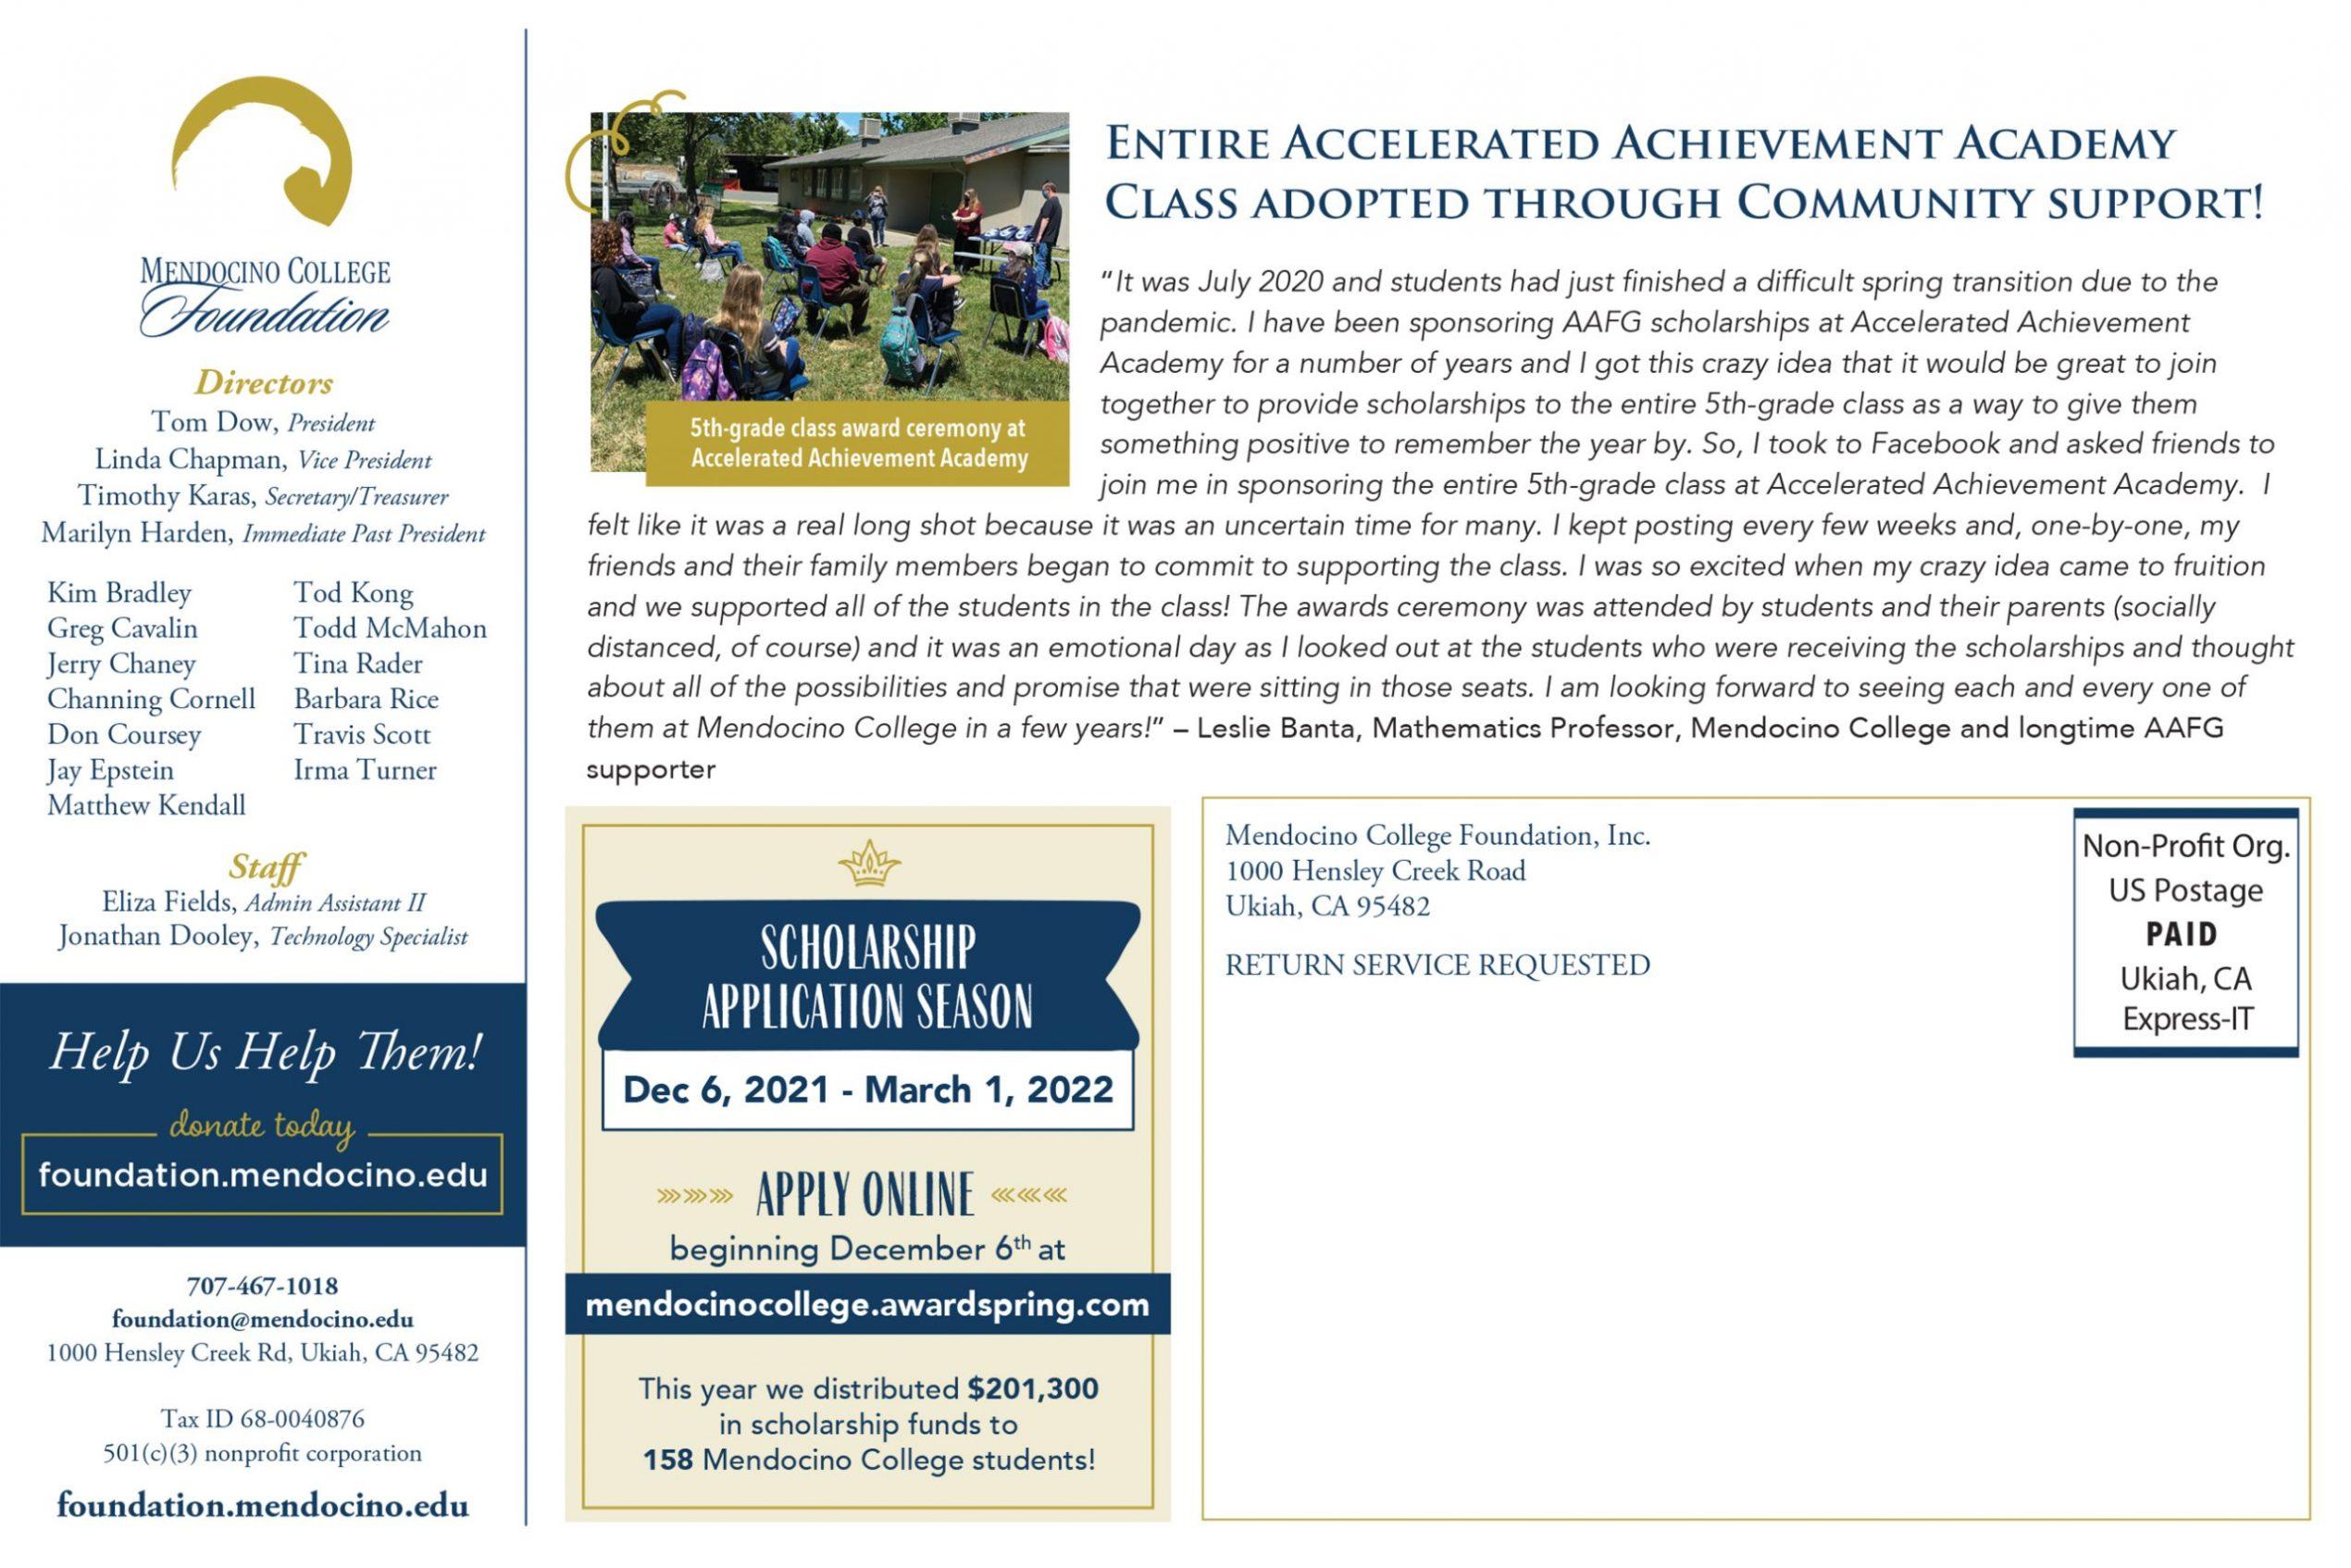 Mendocino College Foundation Newsletter Sept. 2021